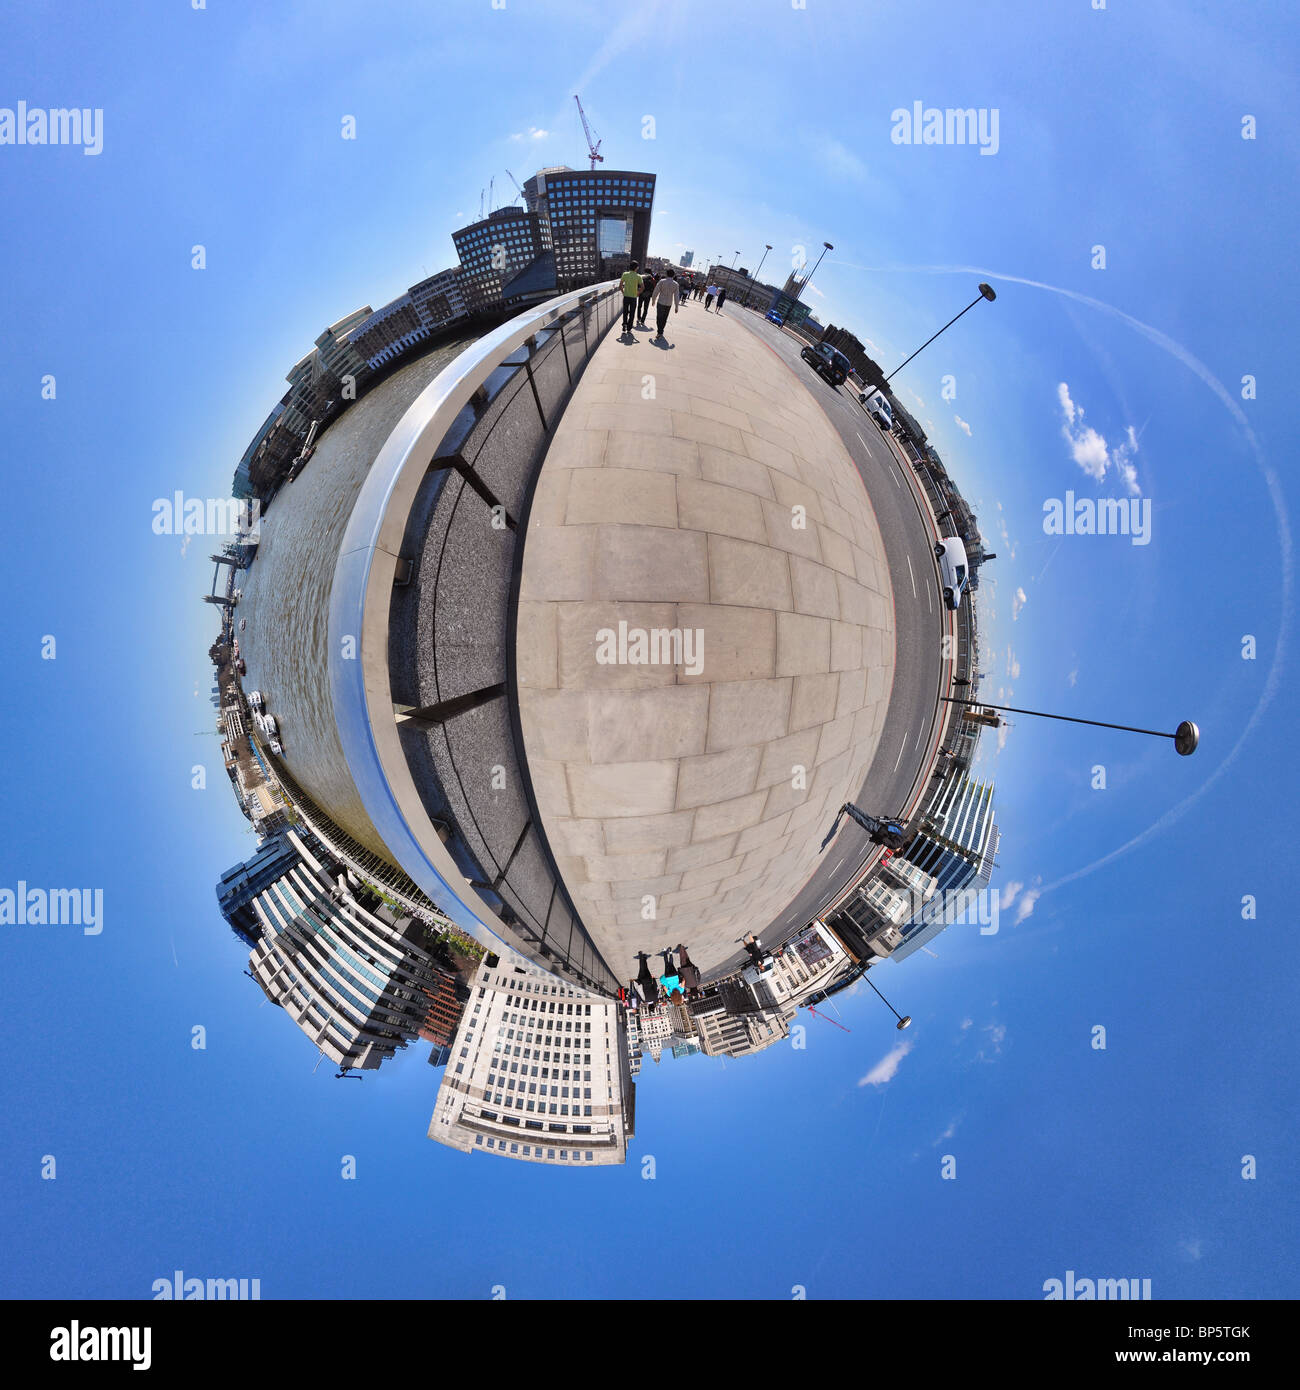 London bridge with little planet effect - Stock Image